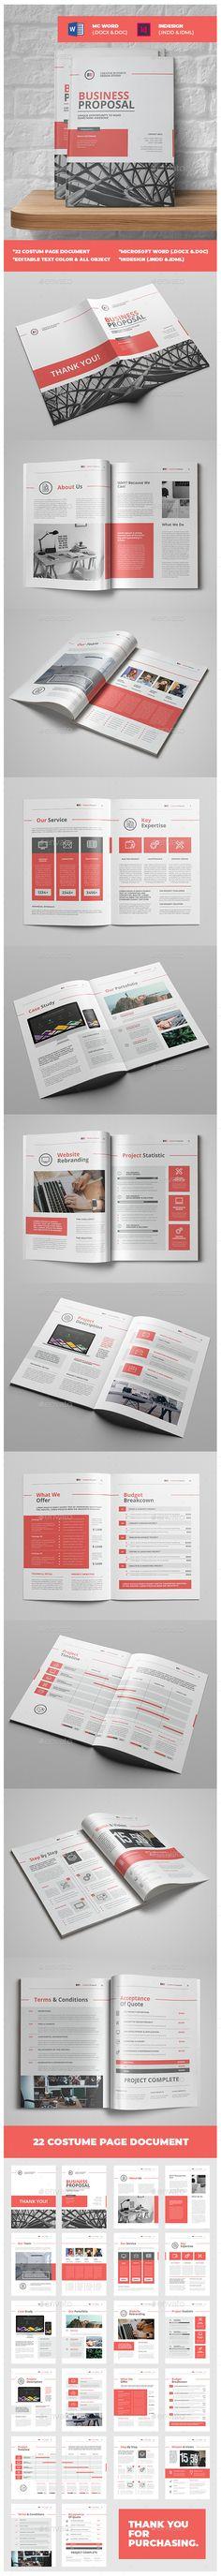 9 best Business Proposal Ideas images on Pinterest Graph design - bid proposal template